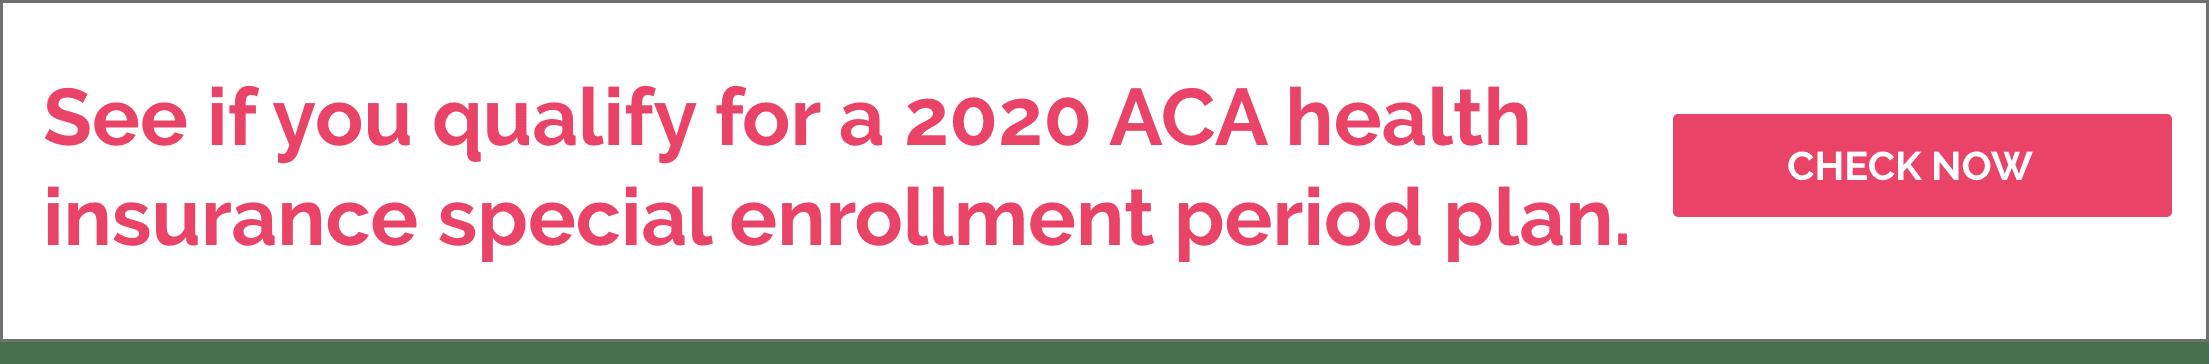 ACA-Post-Banner